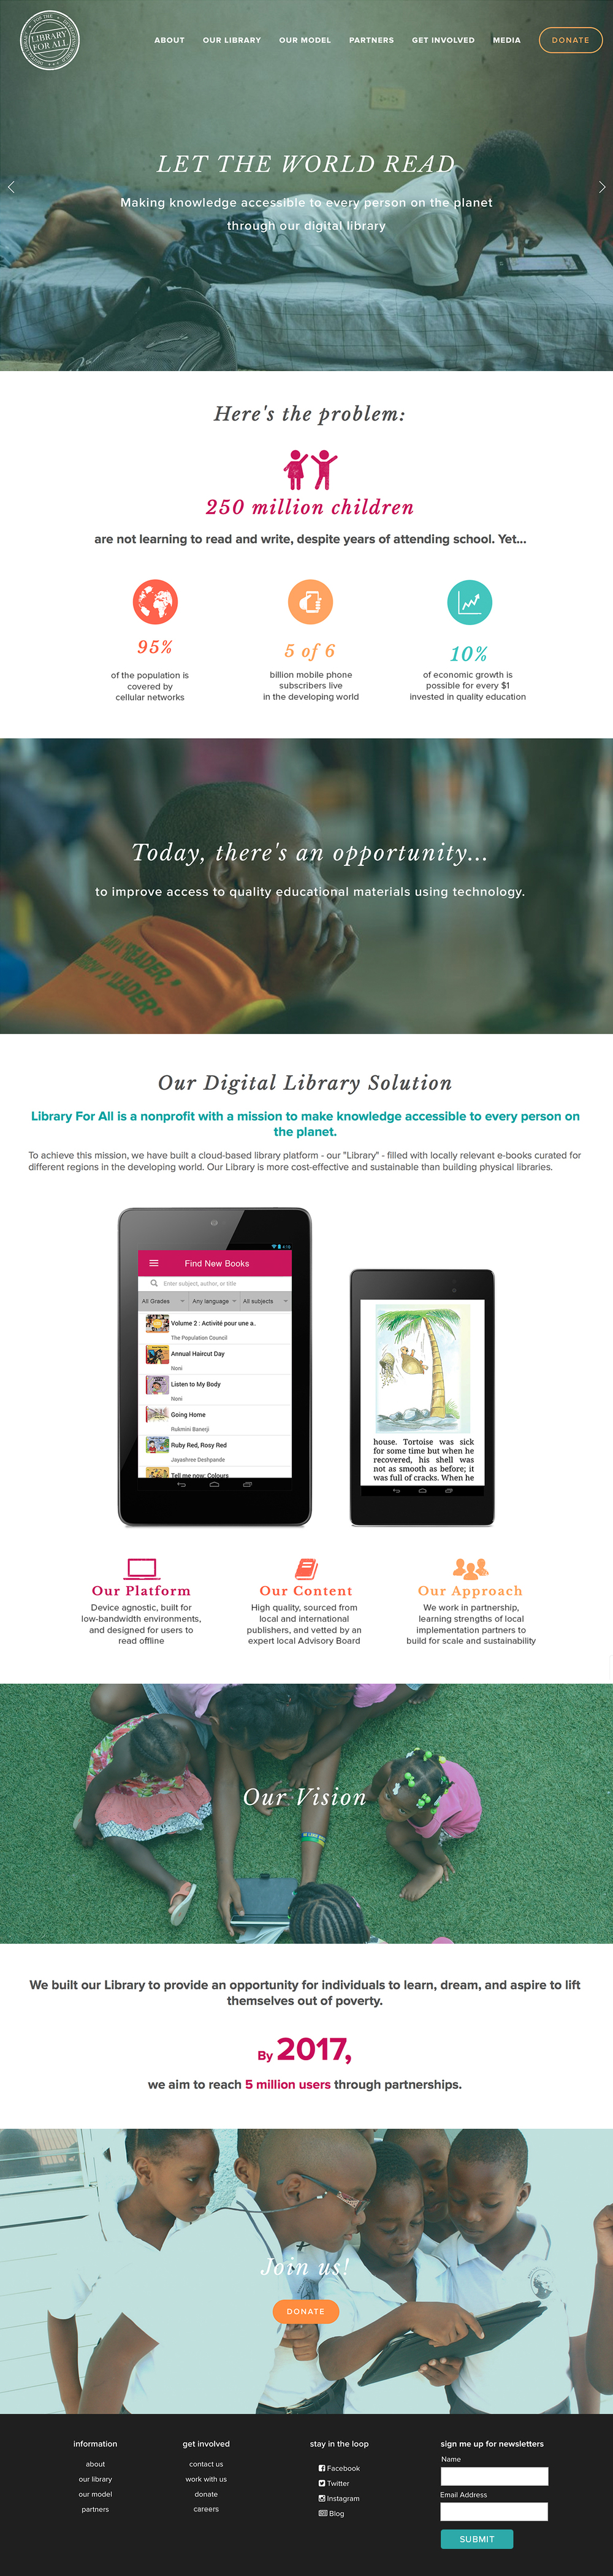 LFA Web Landing Page.png